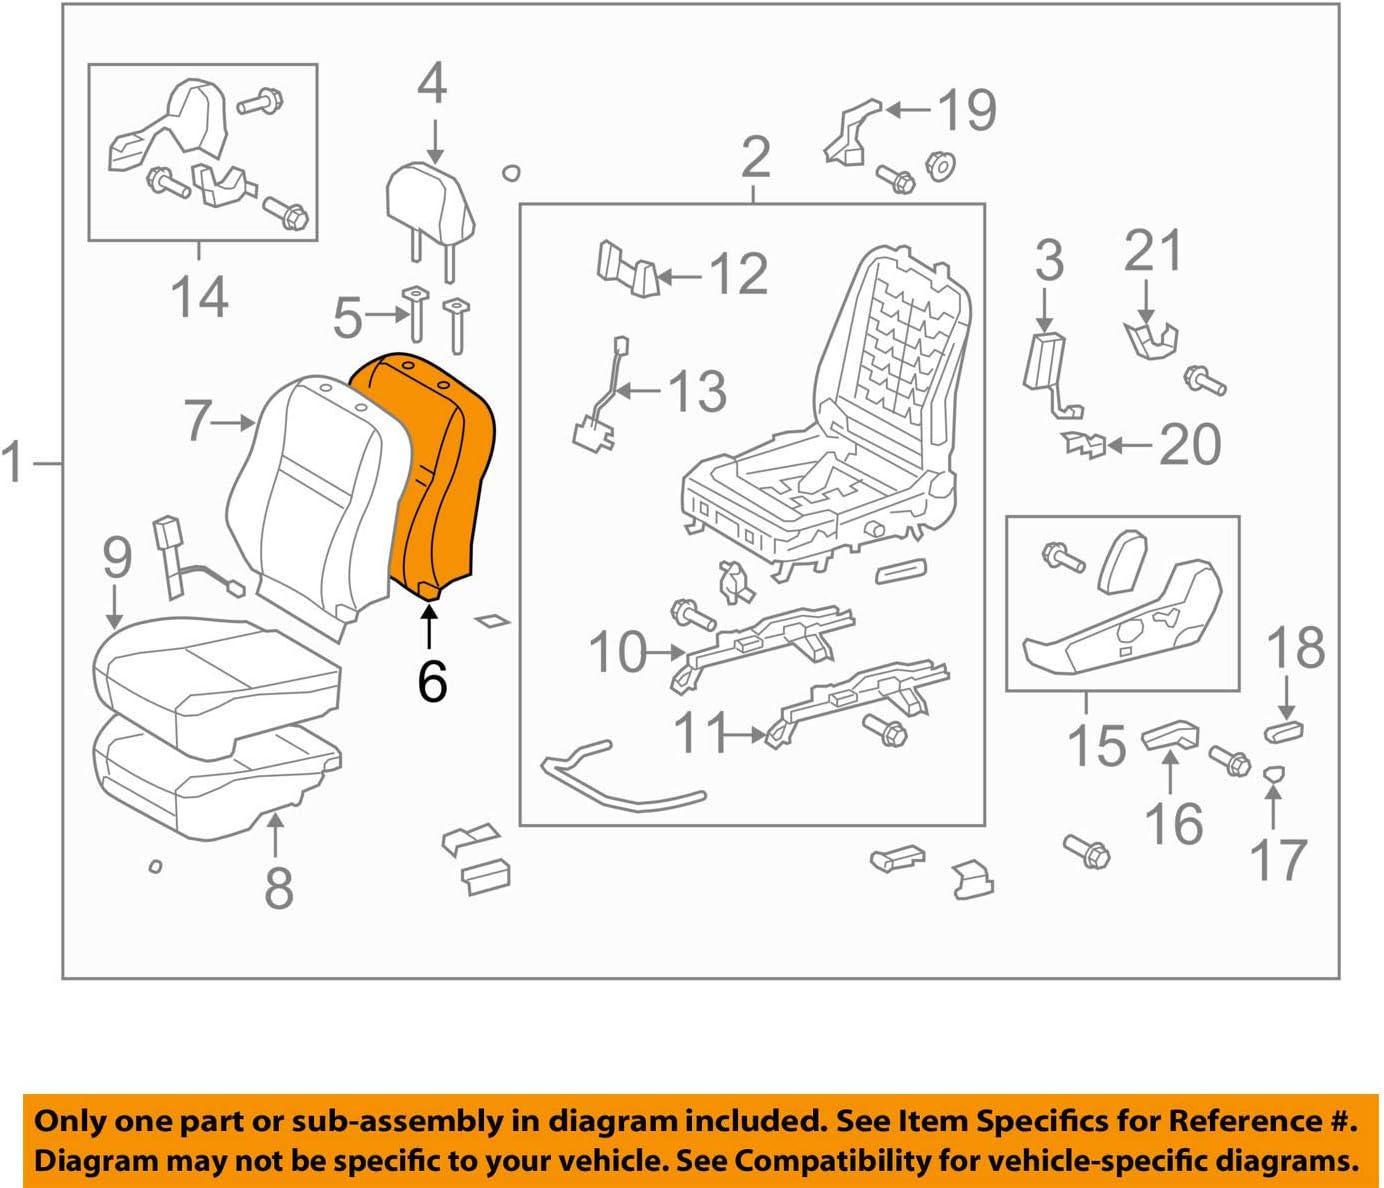 TOYOTA Genuine 71552-12460 Seat Back Pad